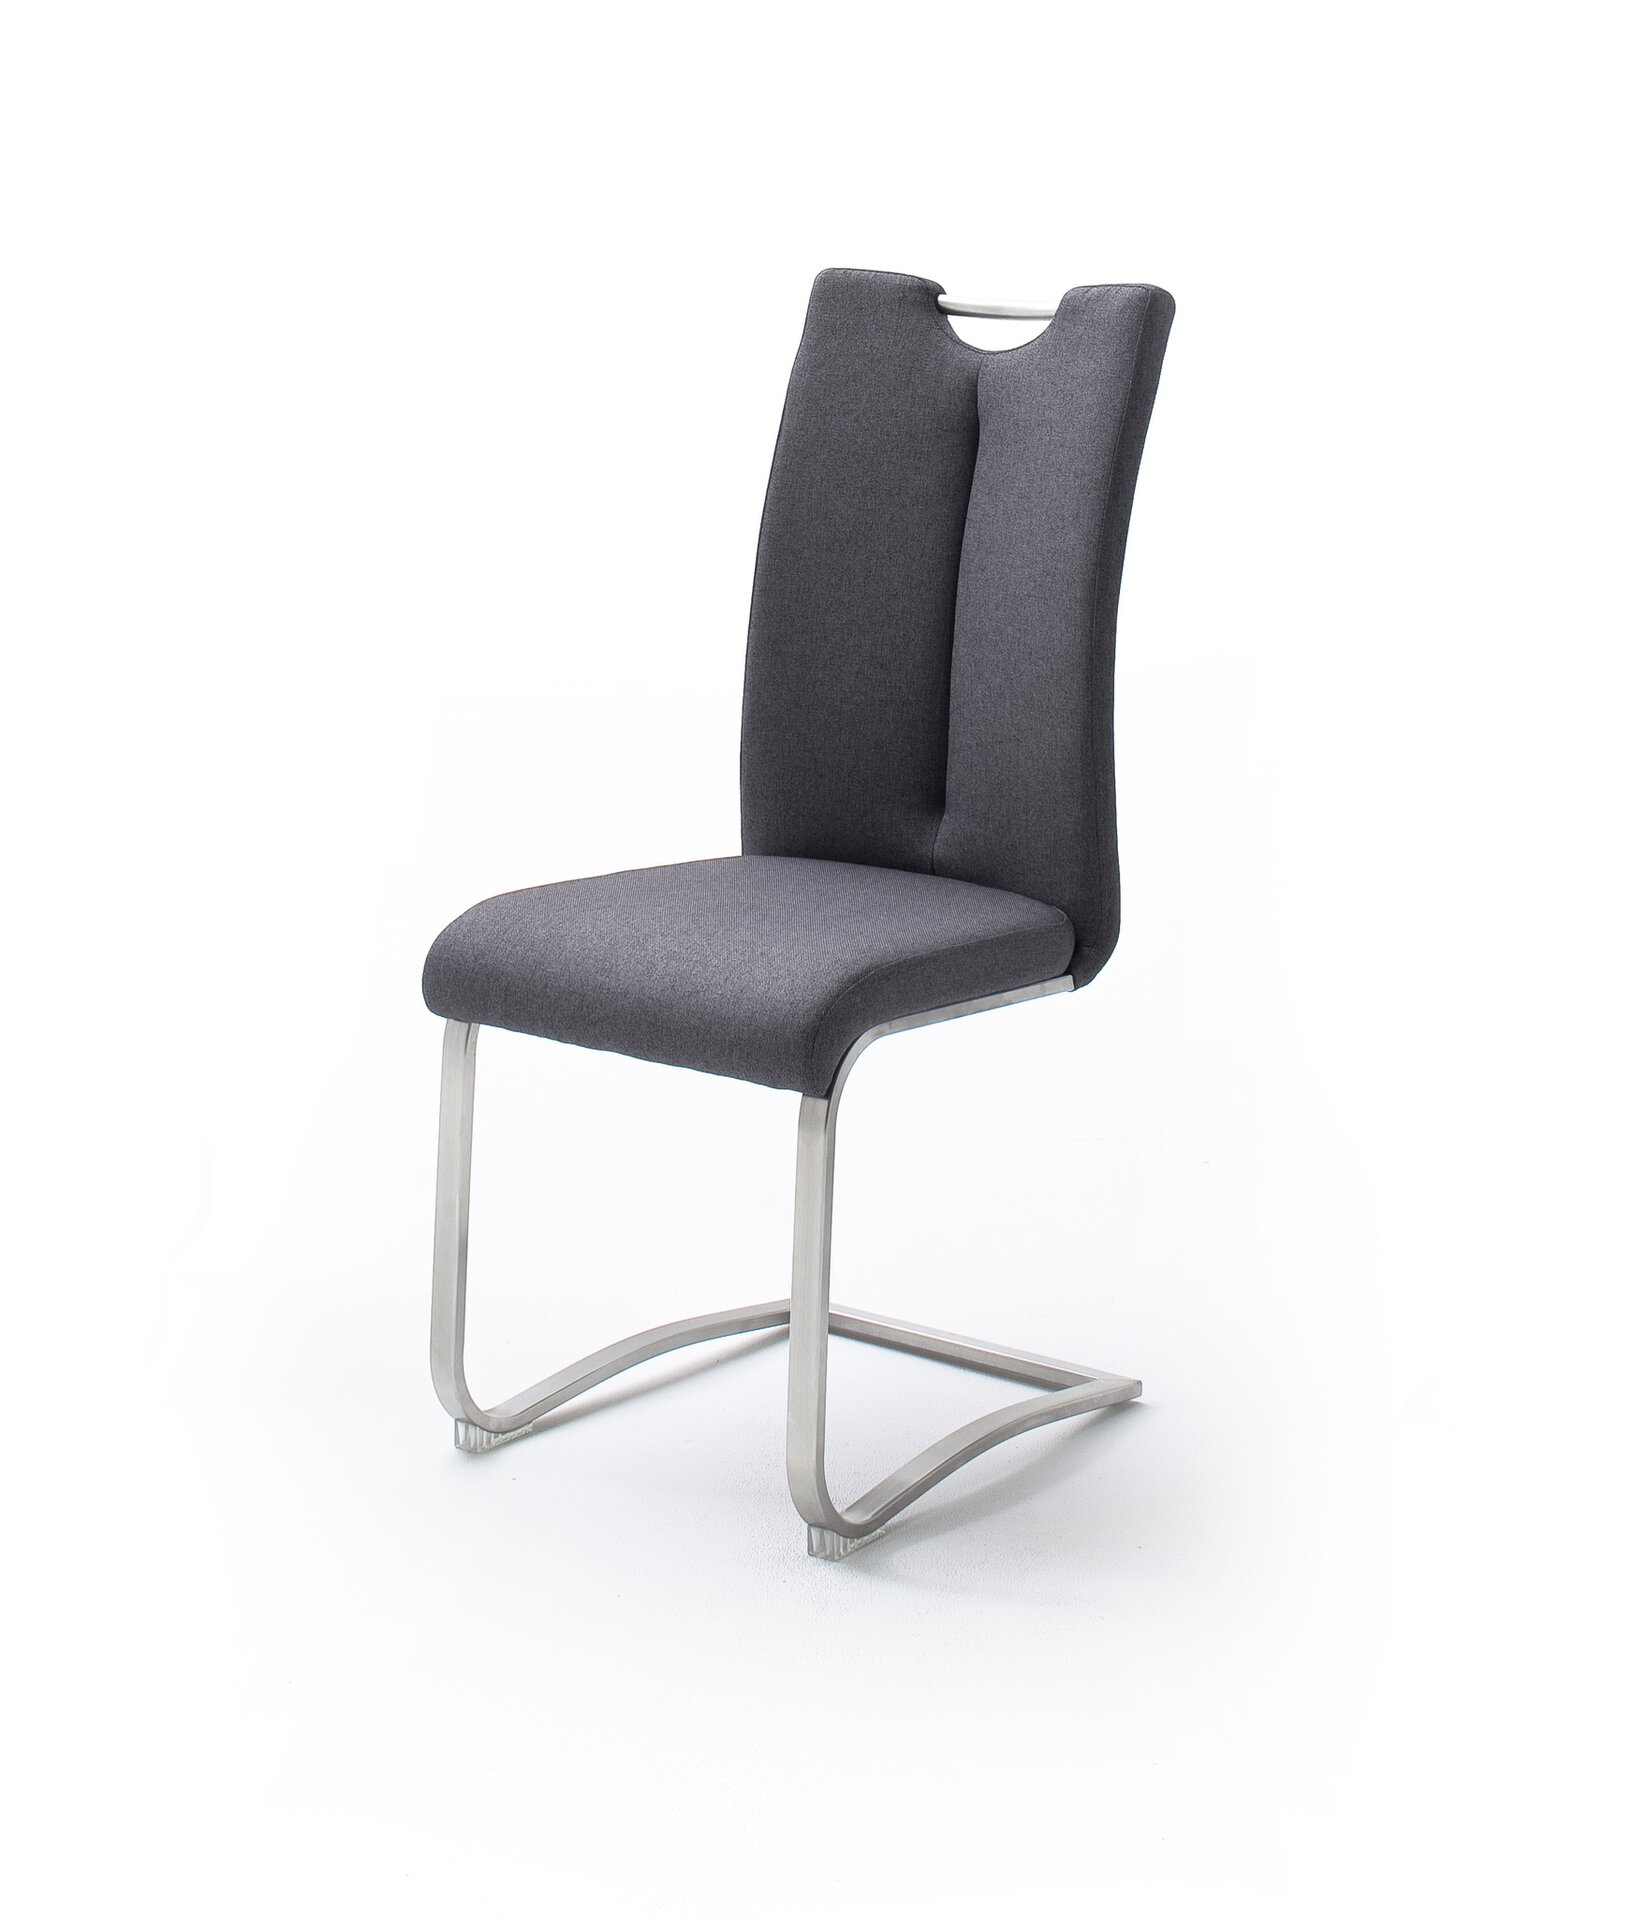 Stuhl ARTOS MCA furniture Textil grau 58 x 102 x 45 cm